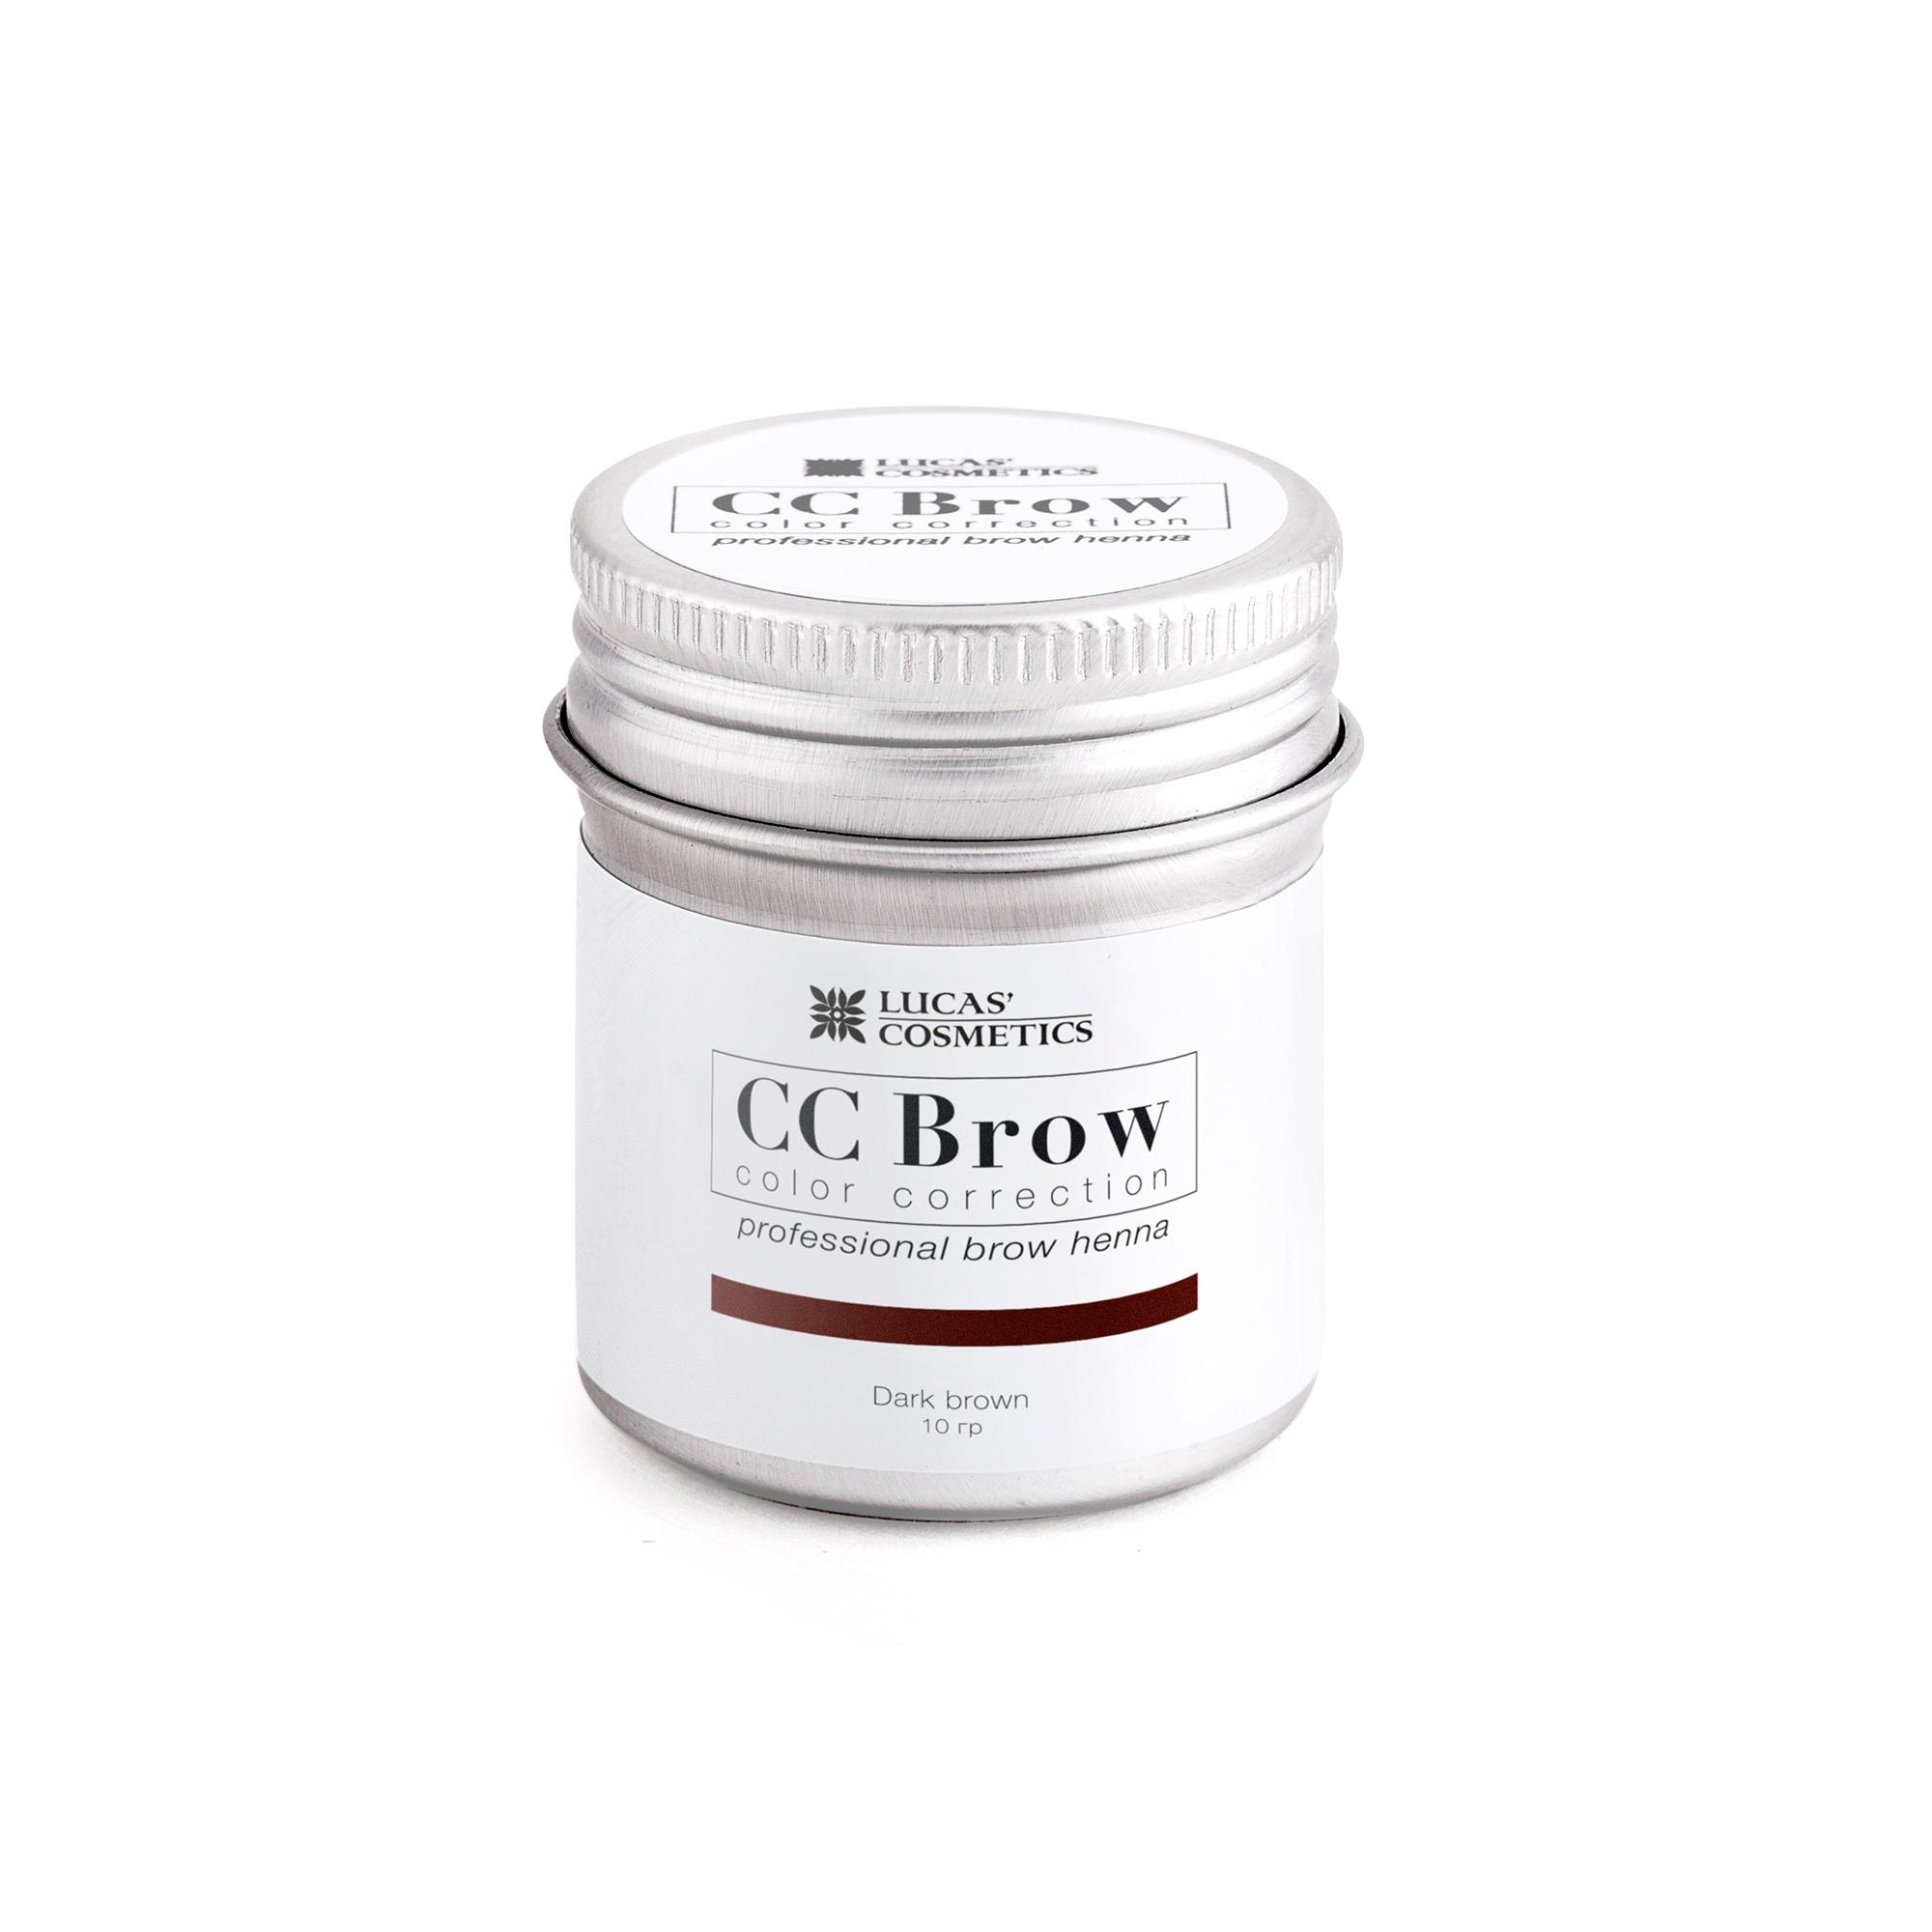 LUCAS' COSMETICS Хна для бровей в баночке (темно-коричневый) / CC Brow (dark brown), 10 гр